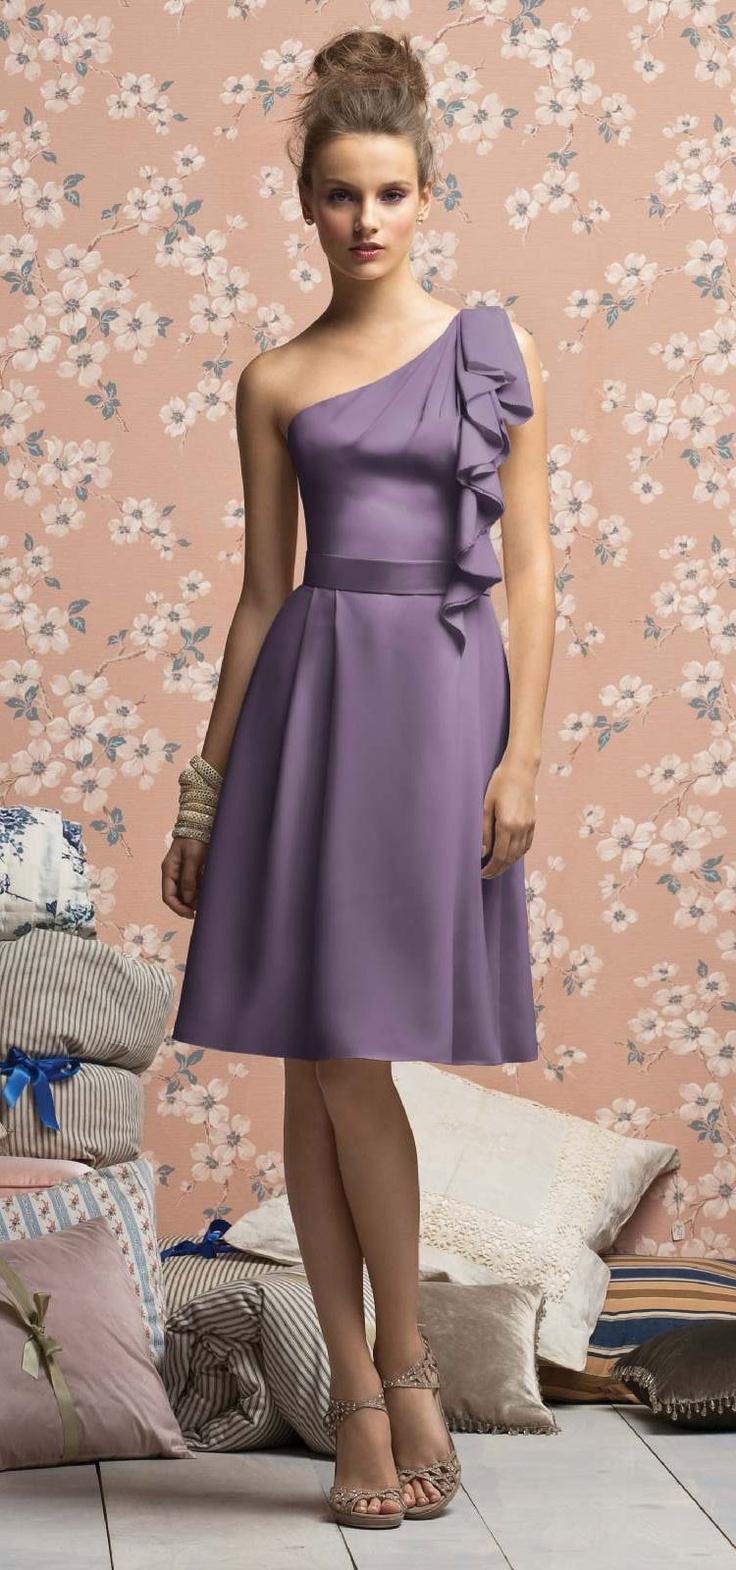 wisteria bridesmaid  dresses | Wisteria Bridesmaid Dresses